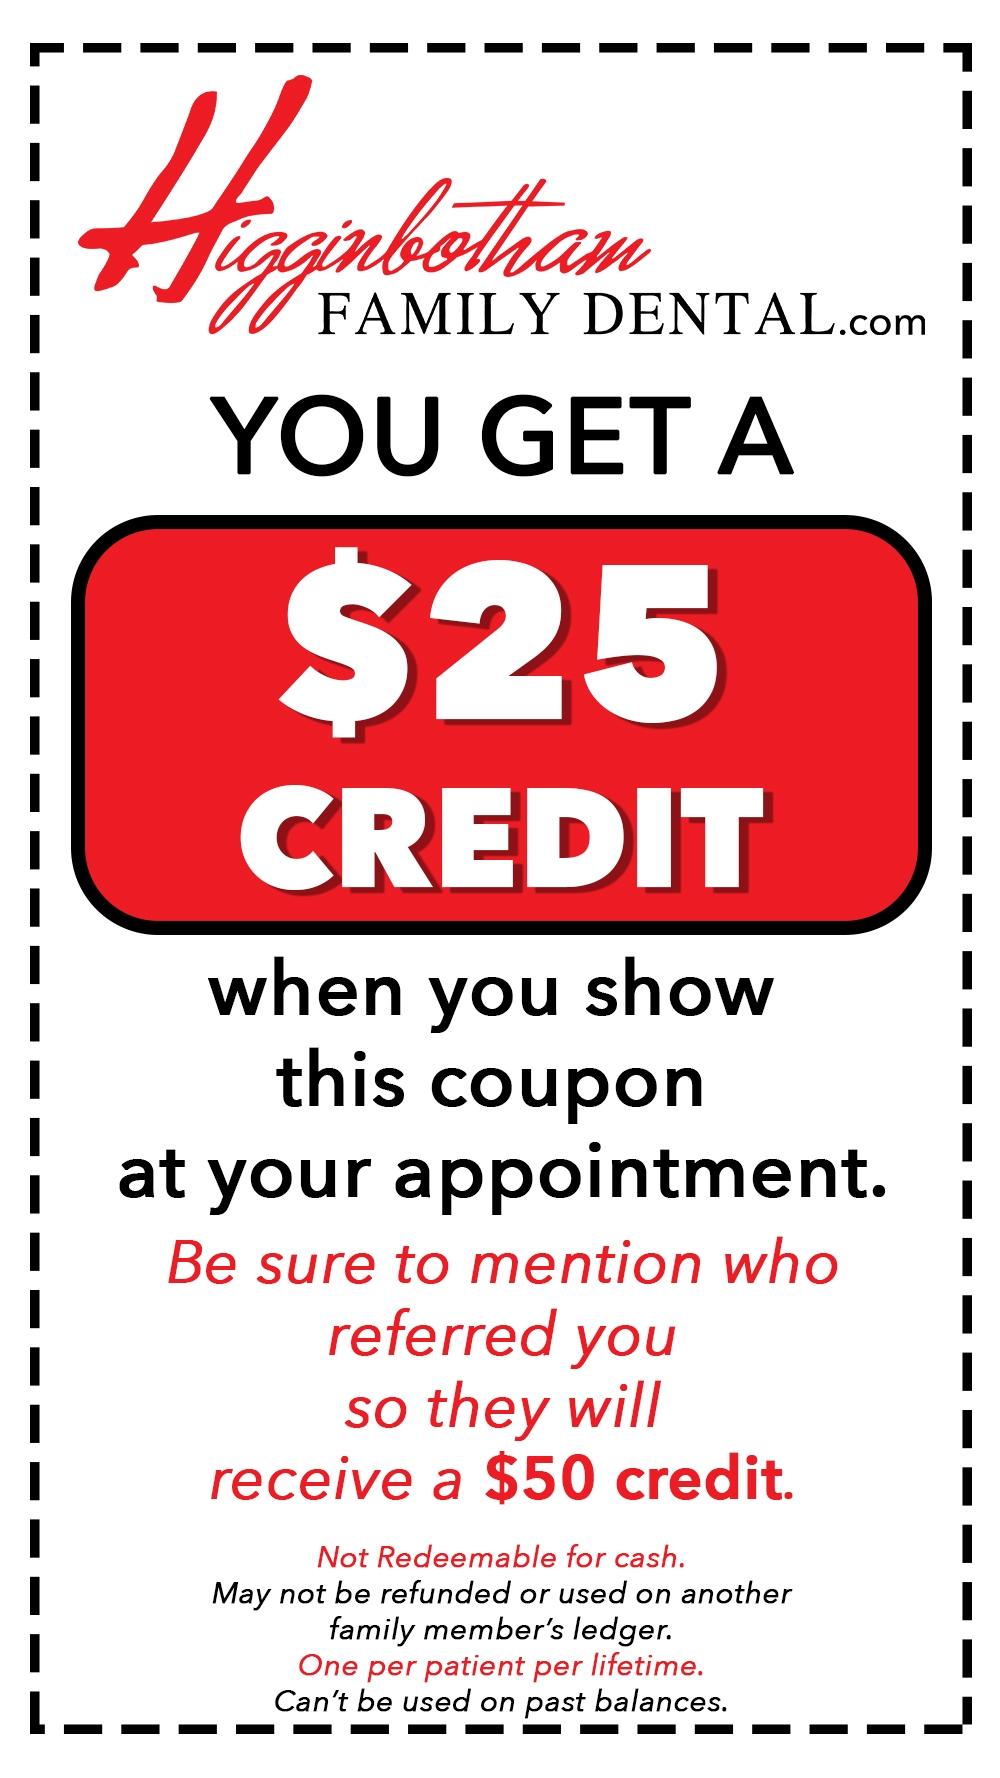 $25 credit coupon